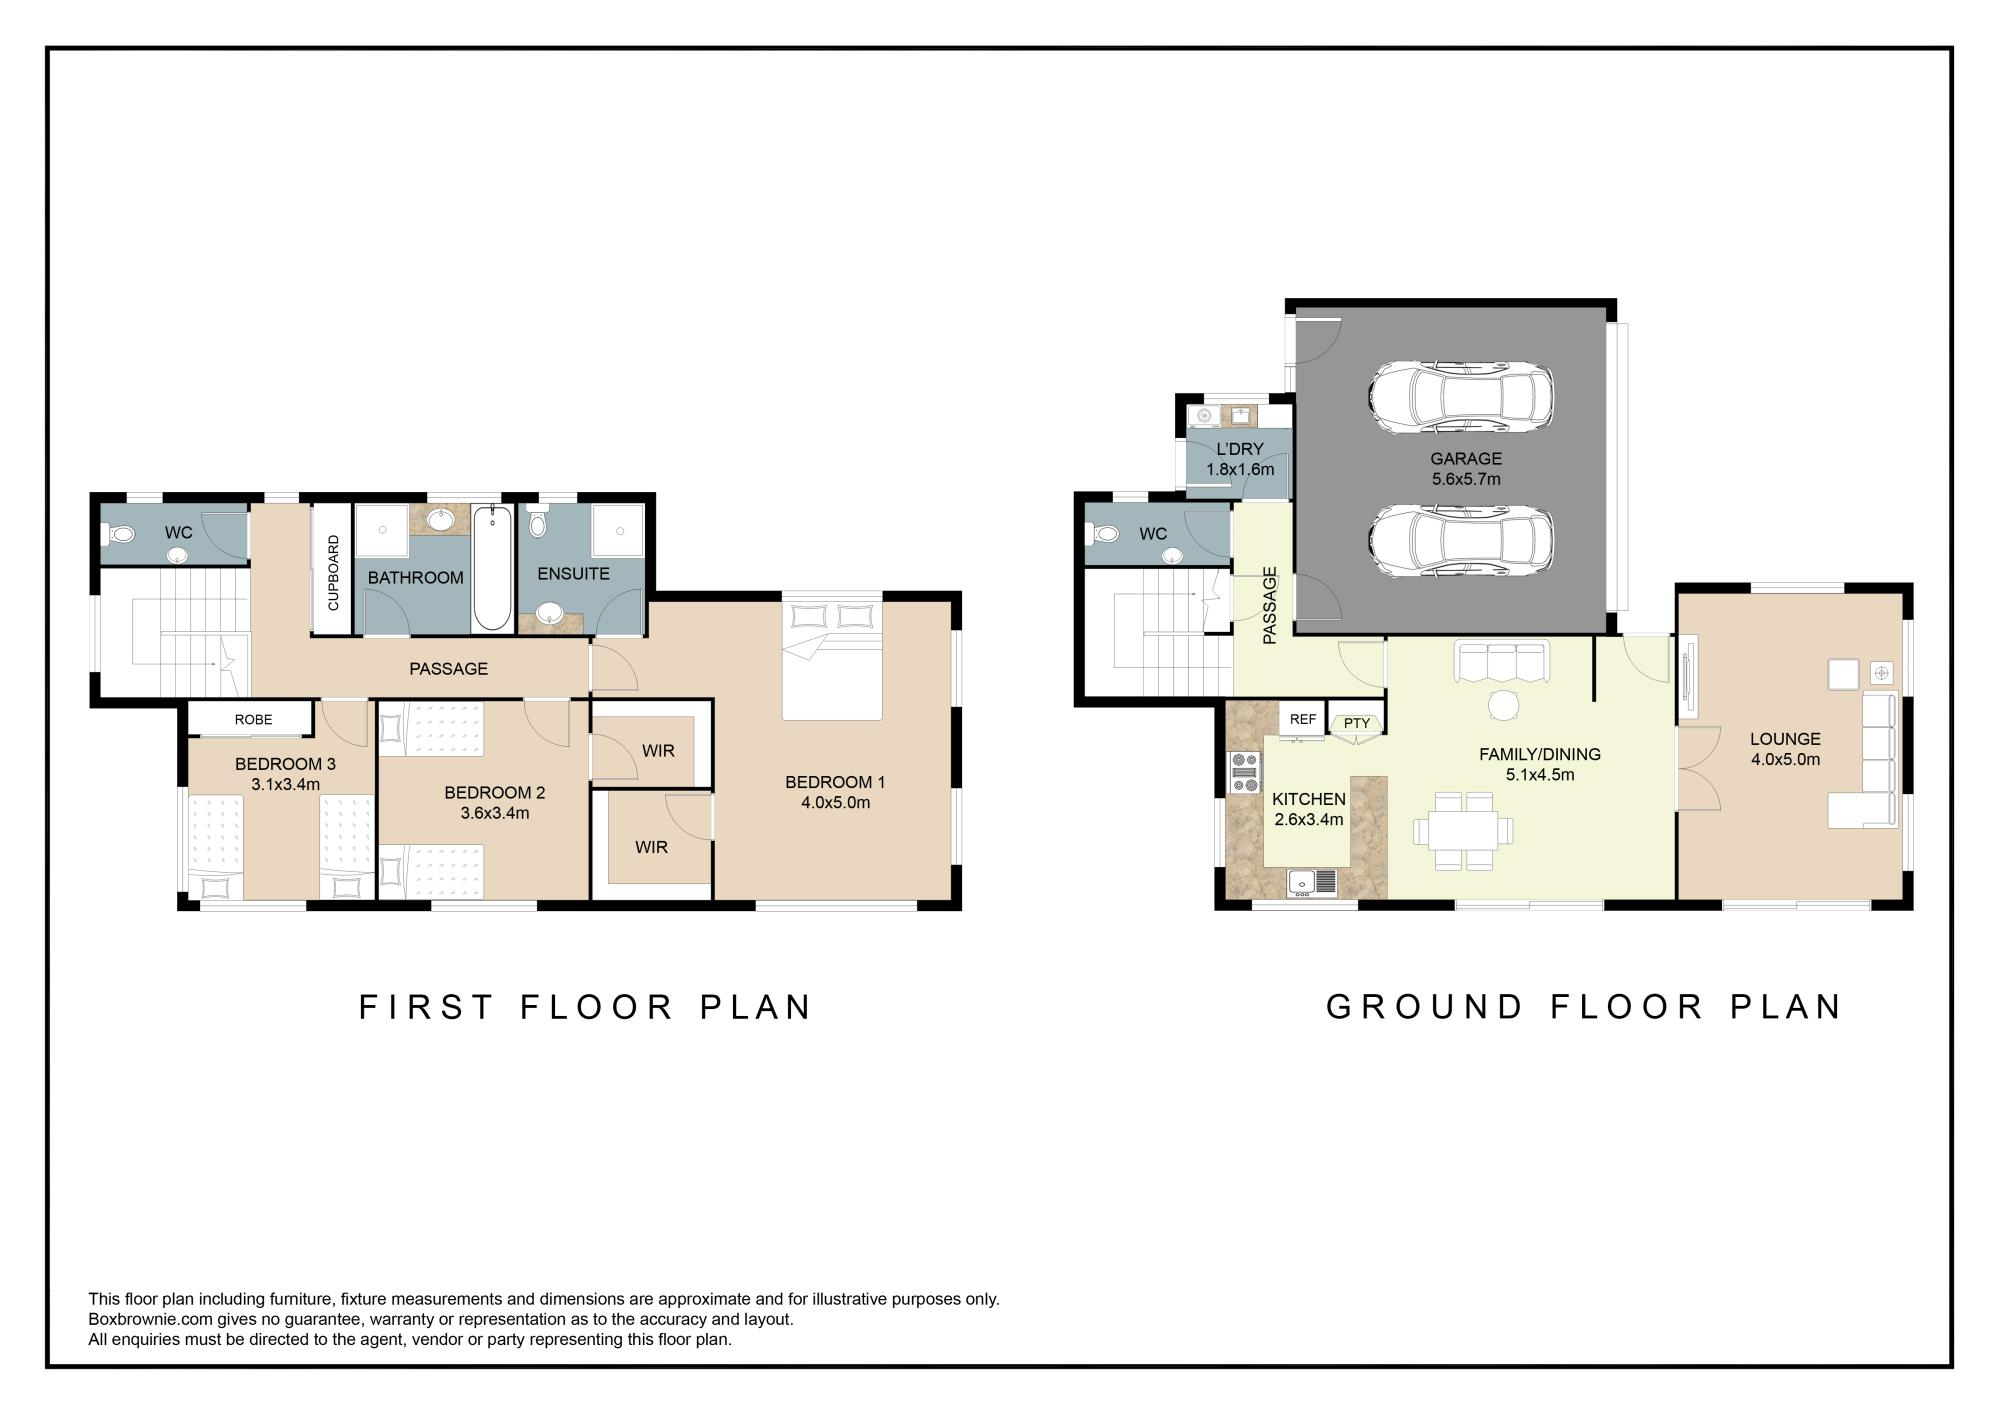 83 Nelson Street Howickproperty floorplan image